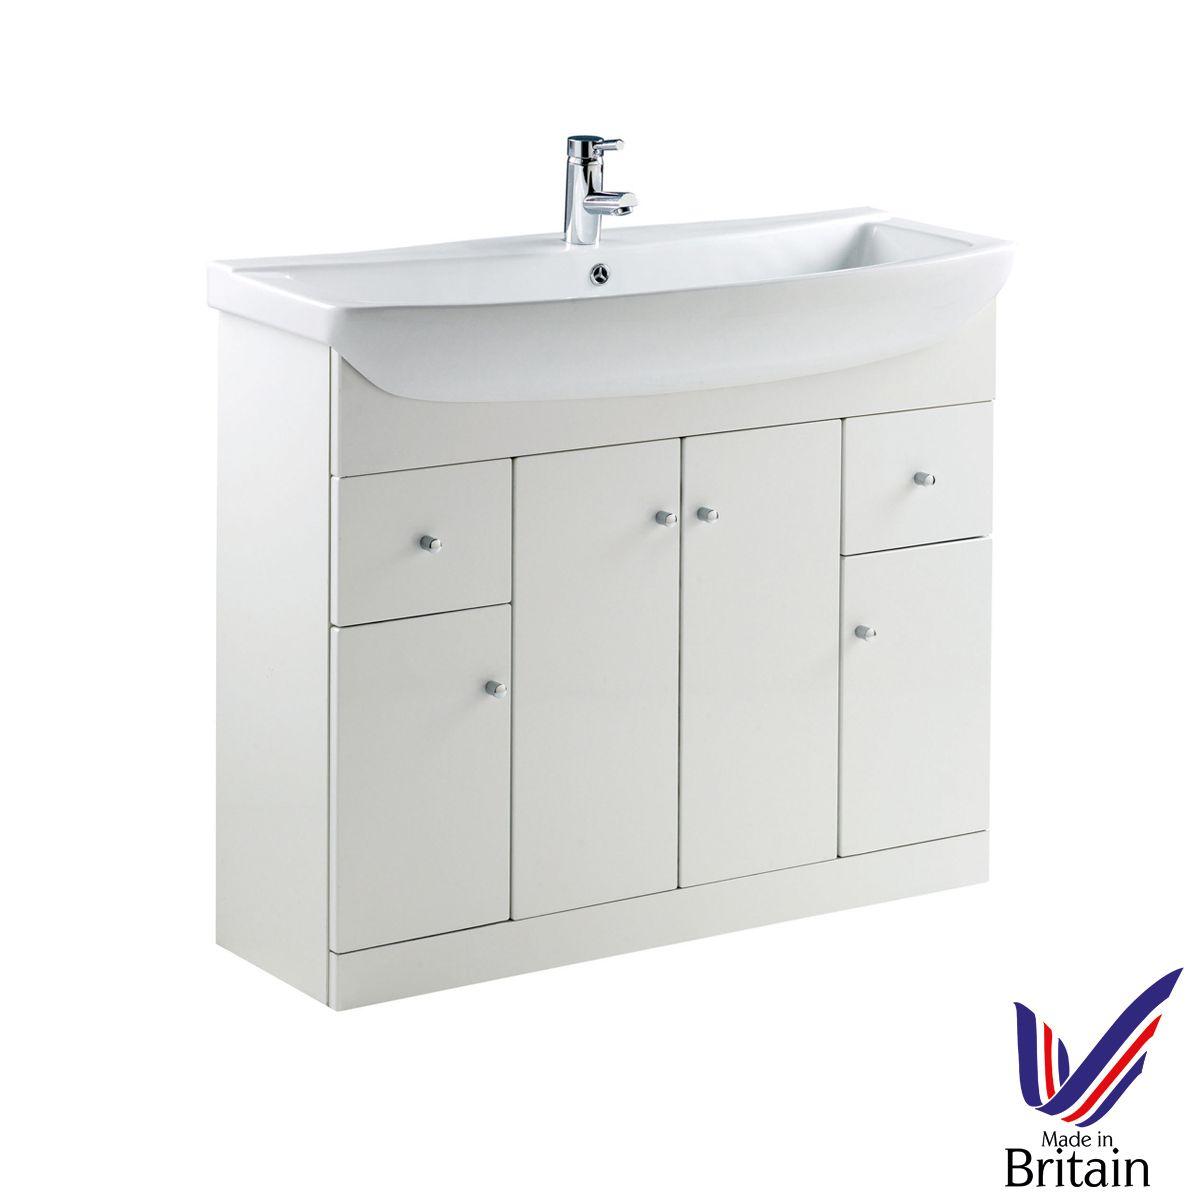 Ikoma White Gloss Vanity Unit with Basin 1050mm